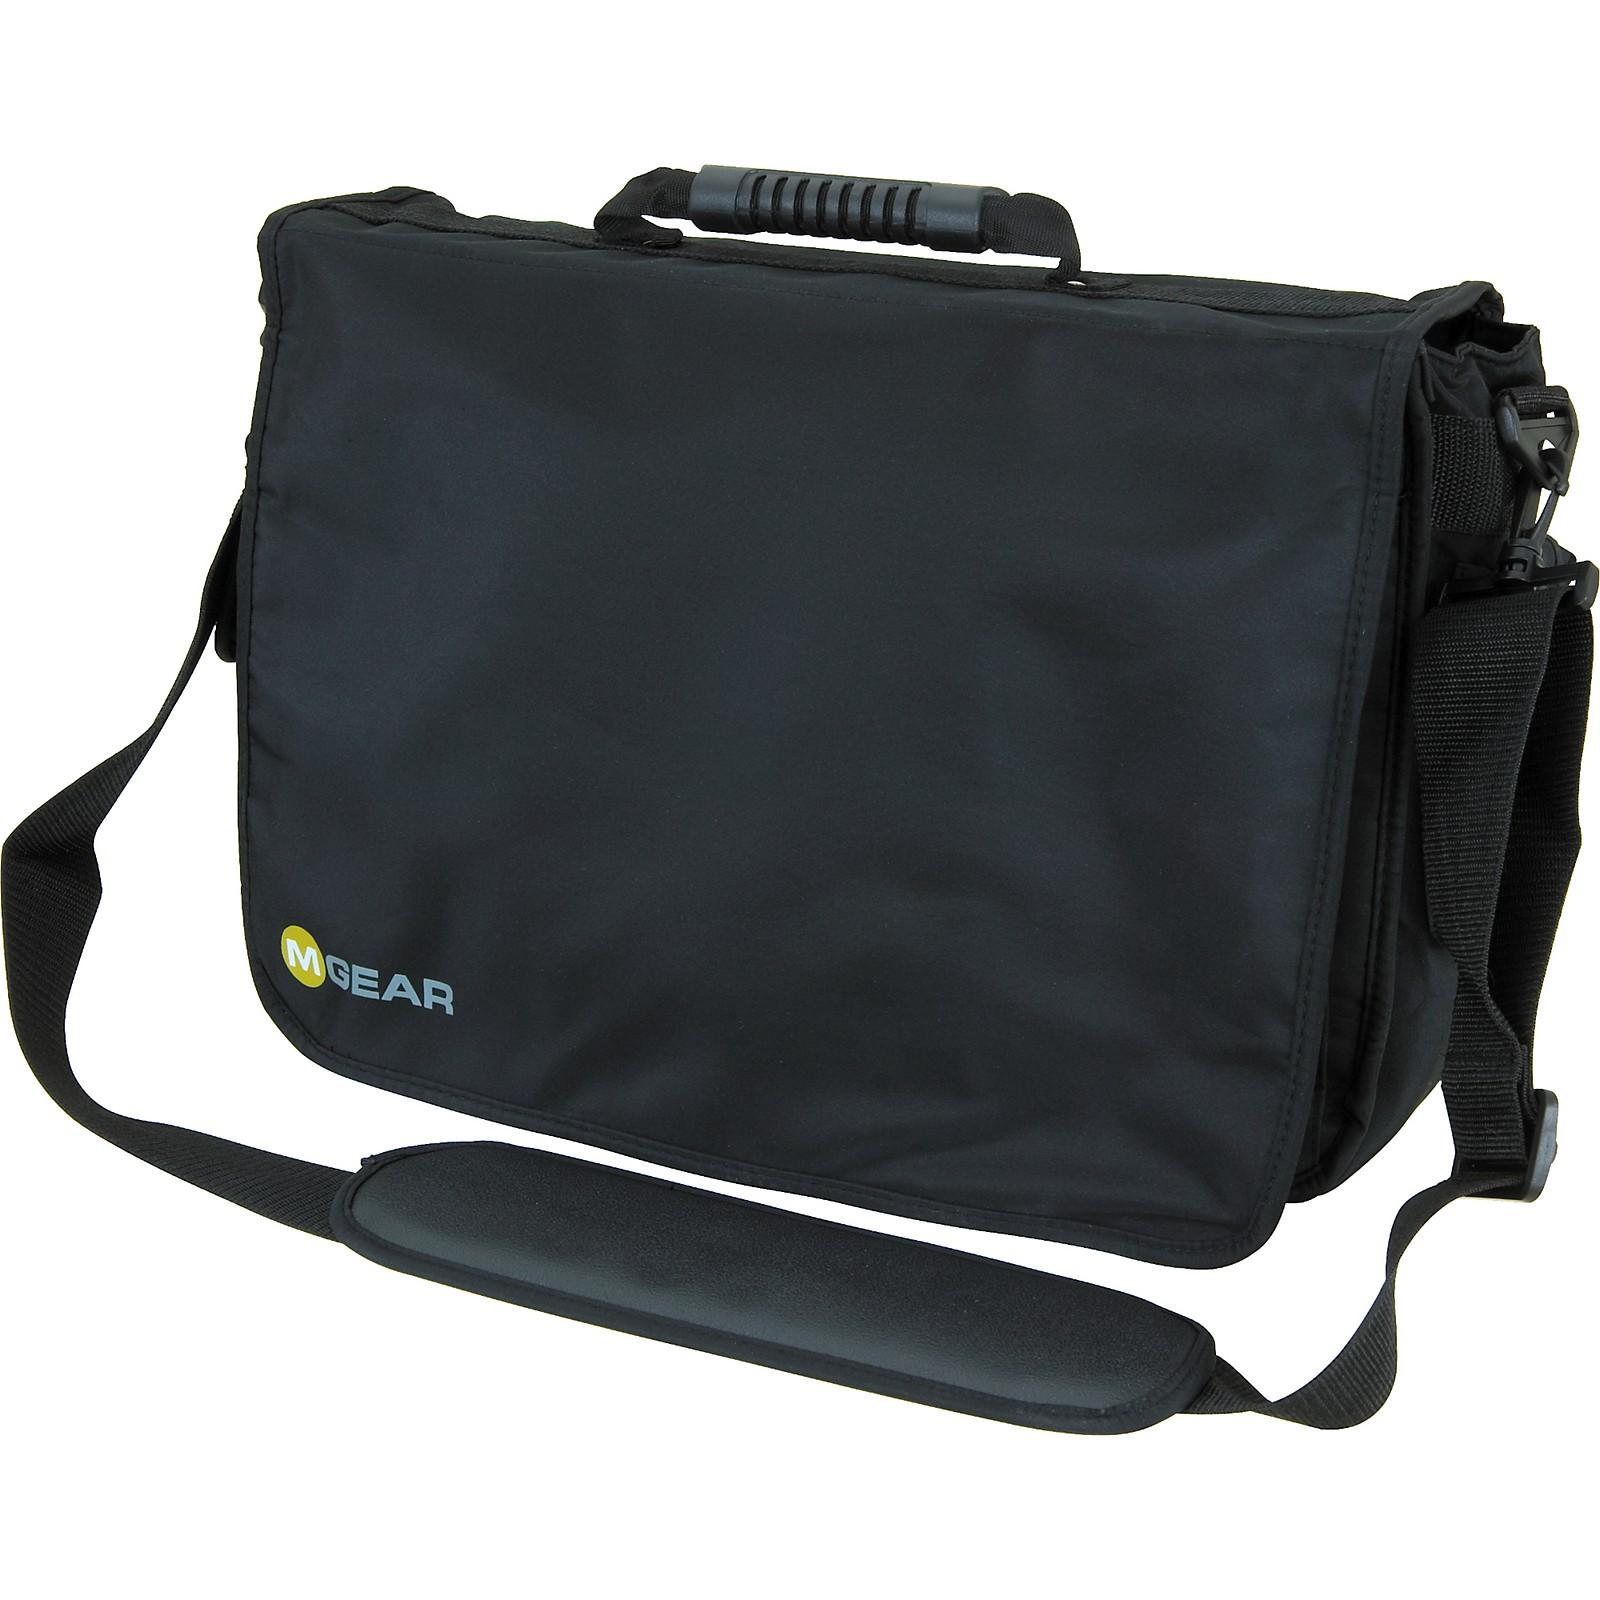 M Audio Mobile Studio Messenger Bag